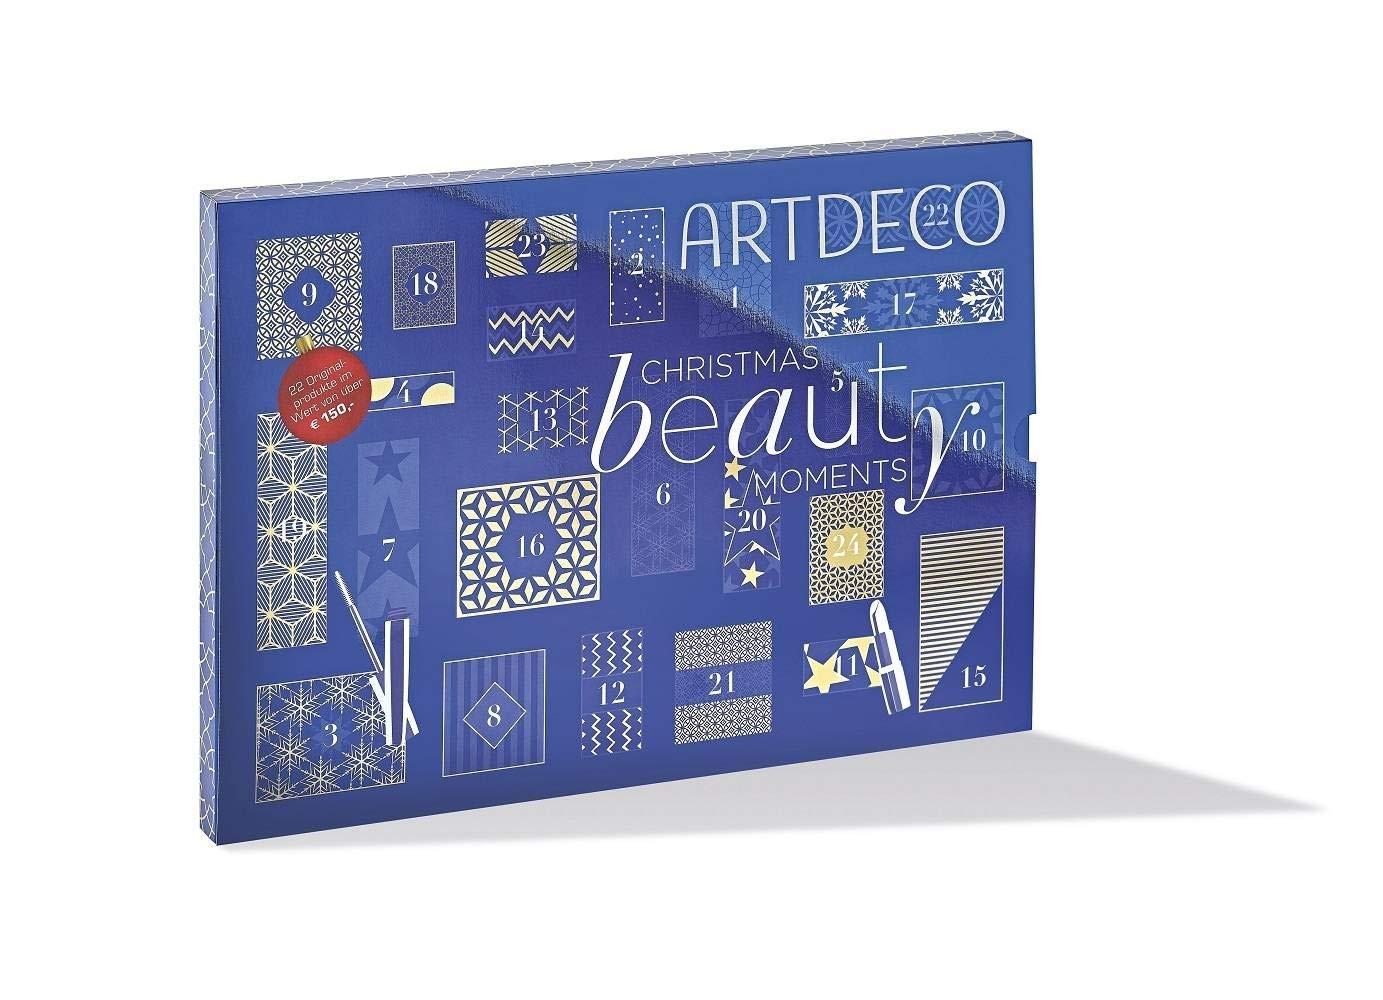 Artdeco > Weihnachten Adventskalender 2018 1 Stück: Amazon.de: Beauty